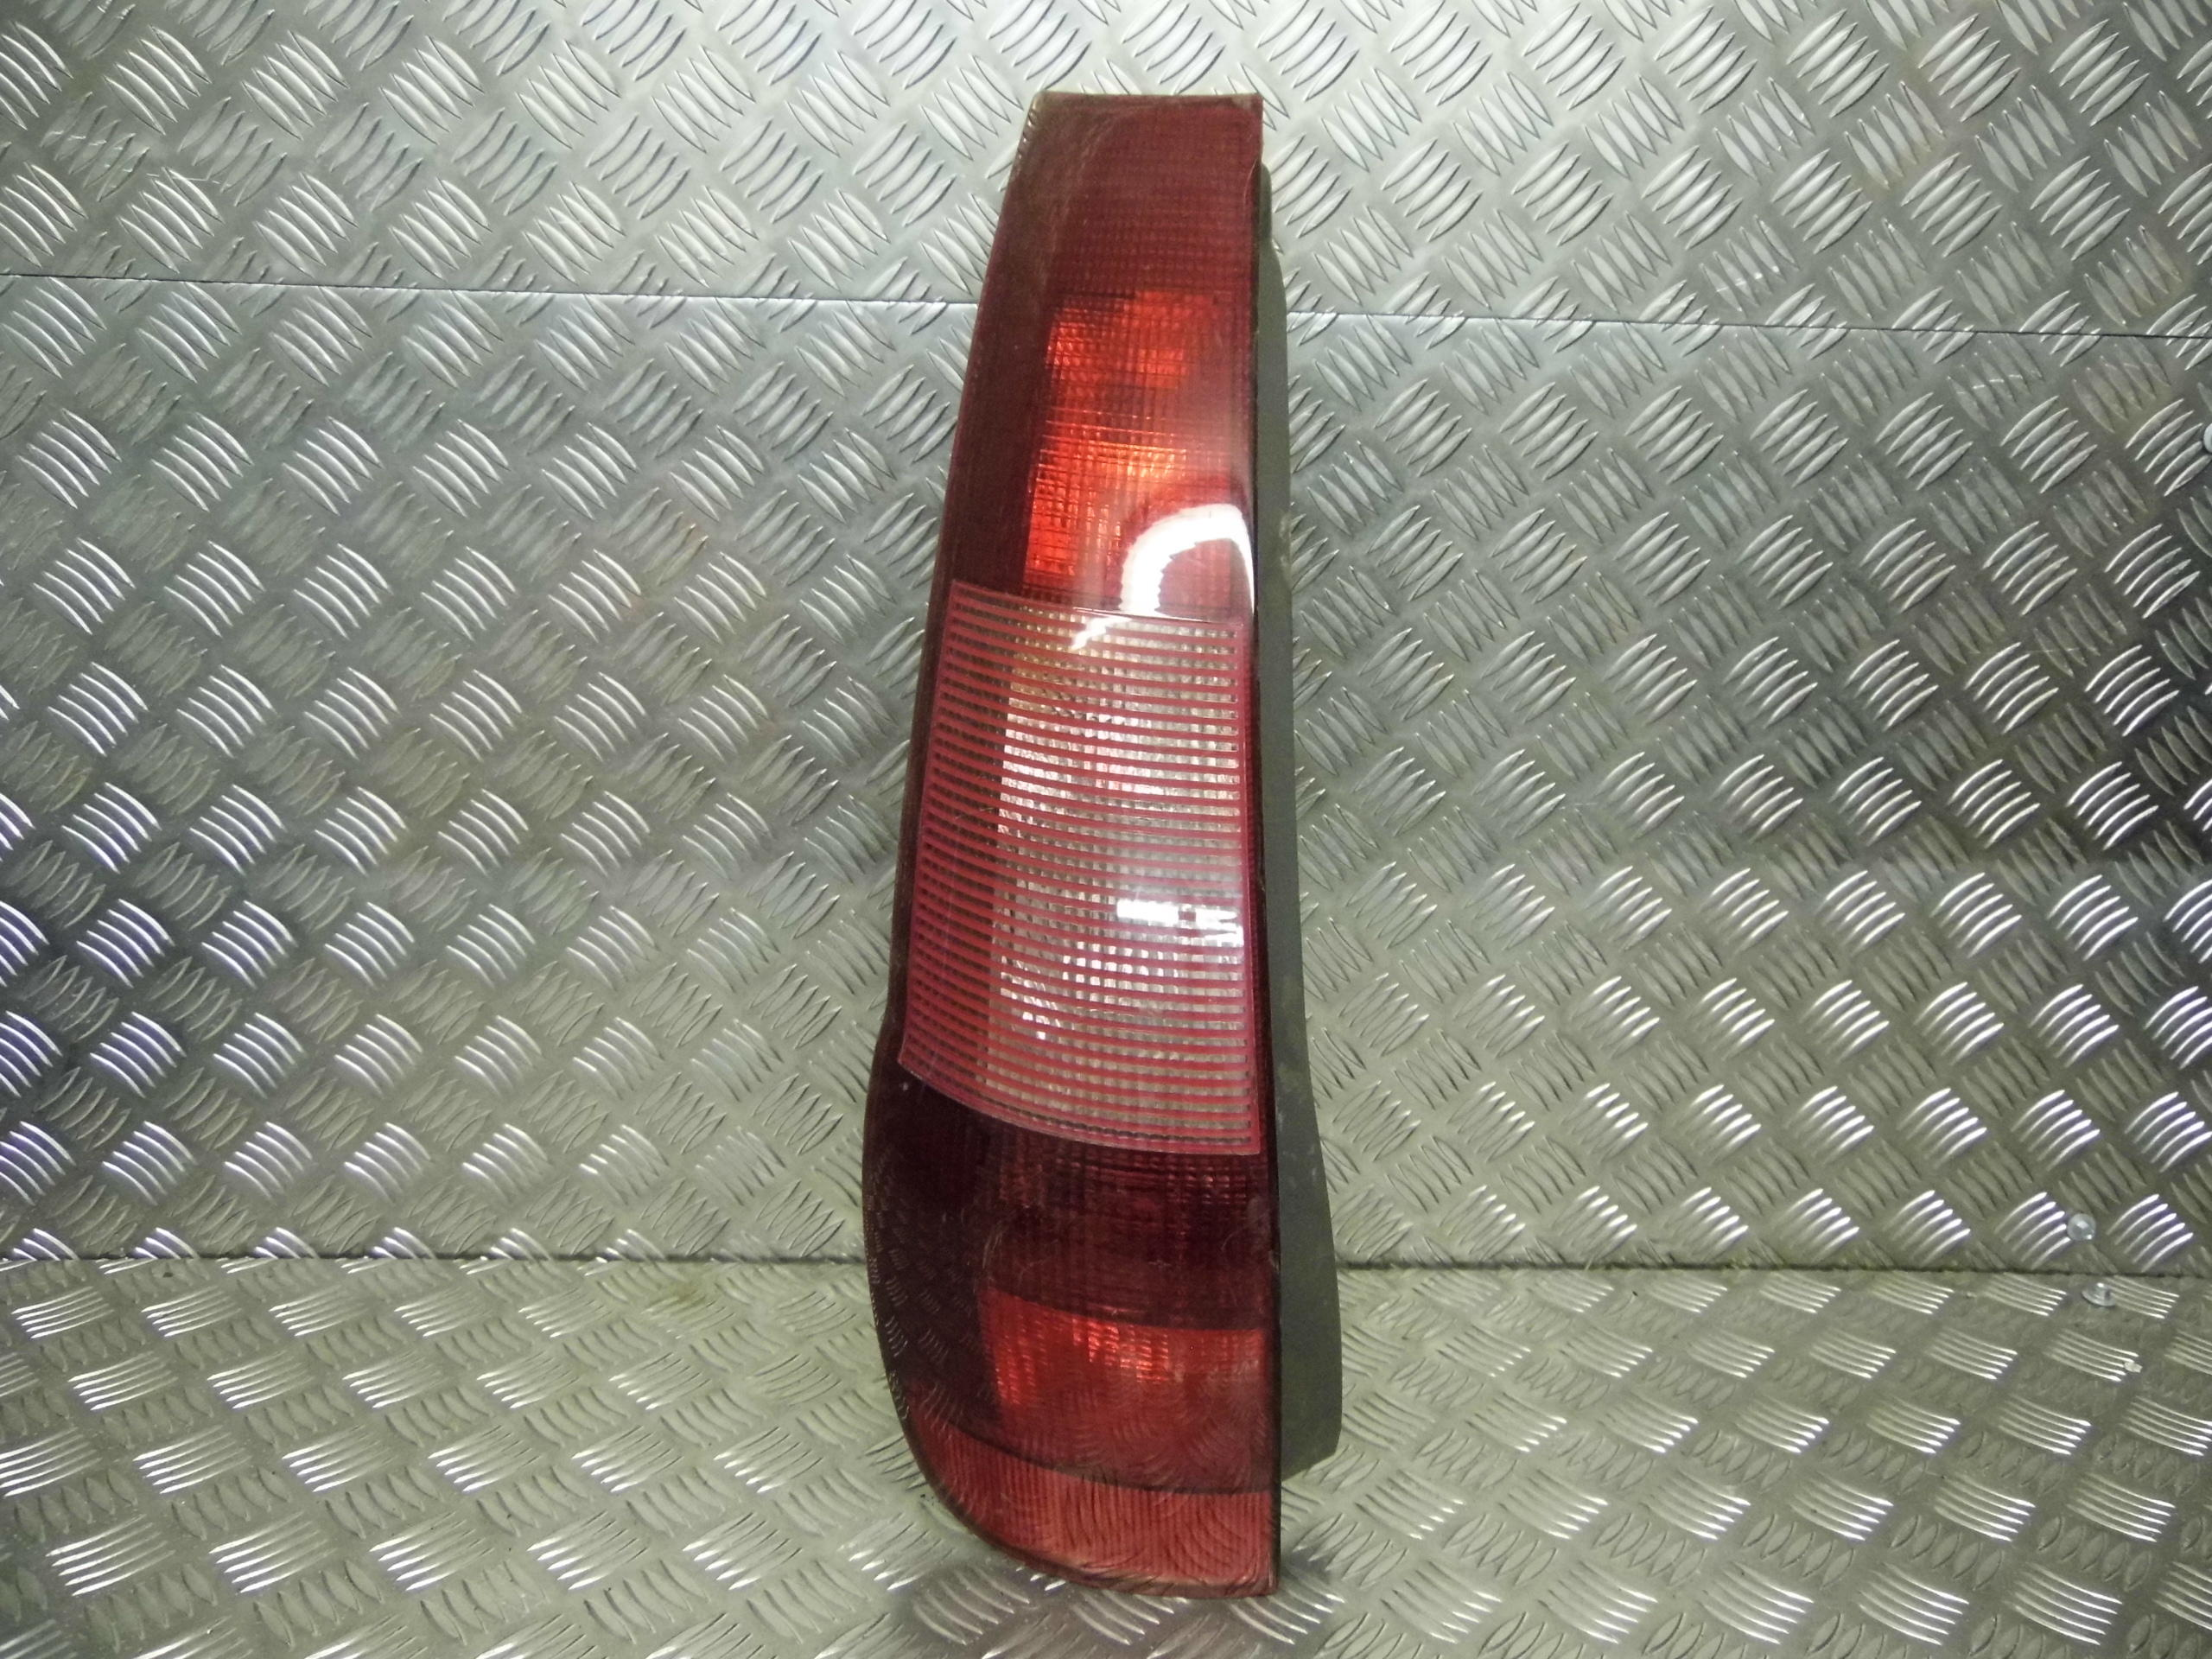 Rear Lights Peugeot 306 Fuse Box Brake 1997 Fiat Punto Hatchback Passengers Side Light Front View